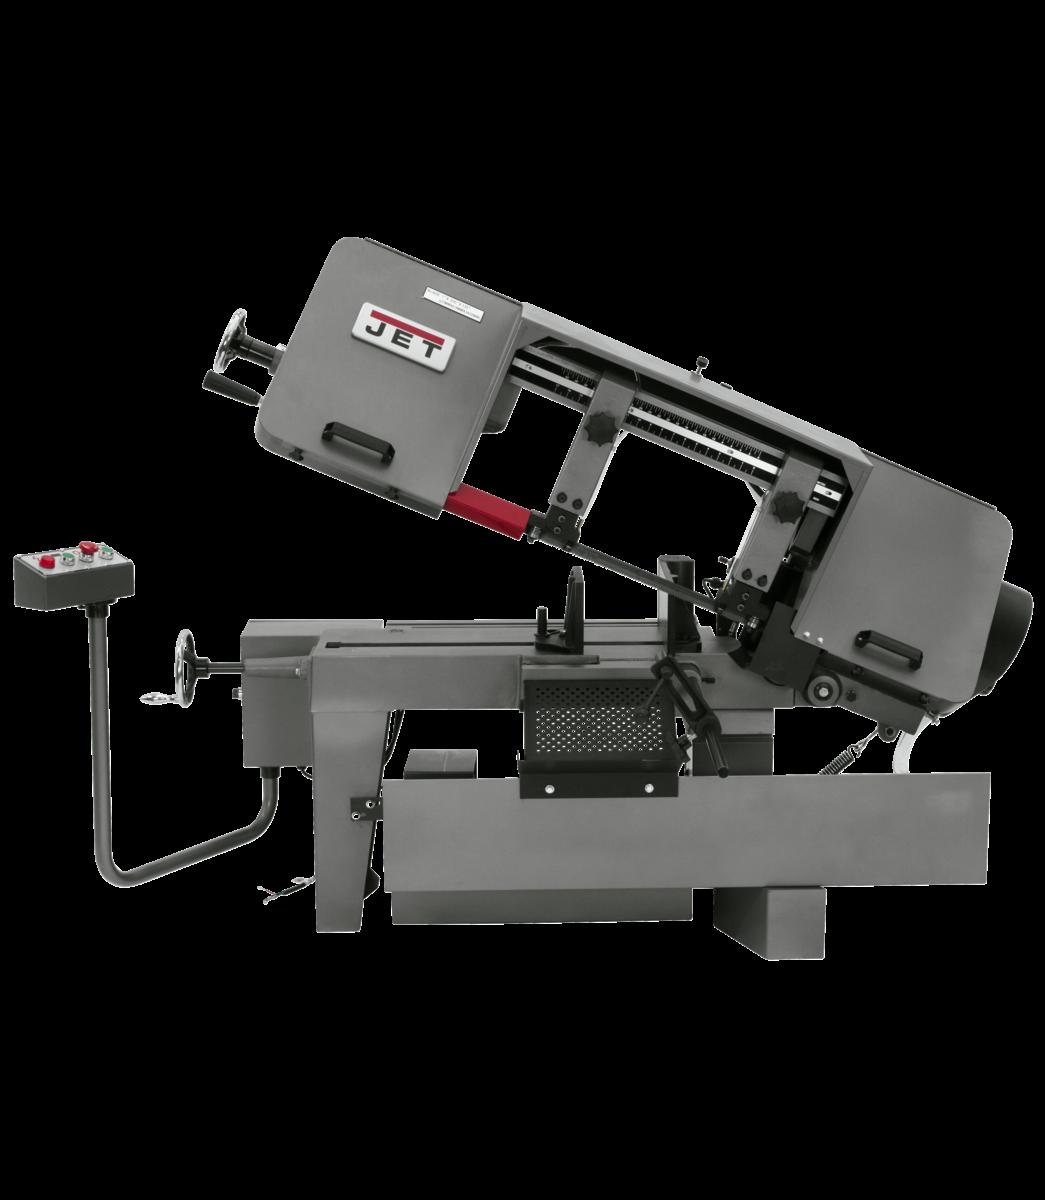 "J-7020 Sierra-cinta horizontal de 10x16"", 1-1/2 HP, 115/230 V, monofásica"